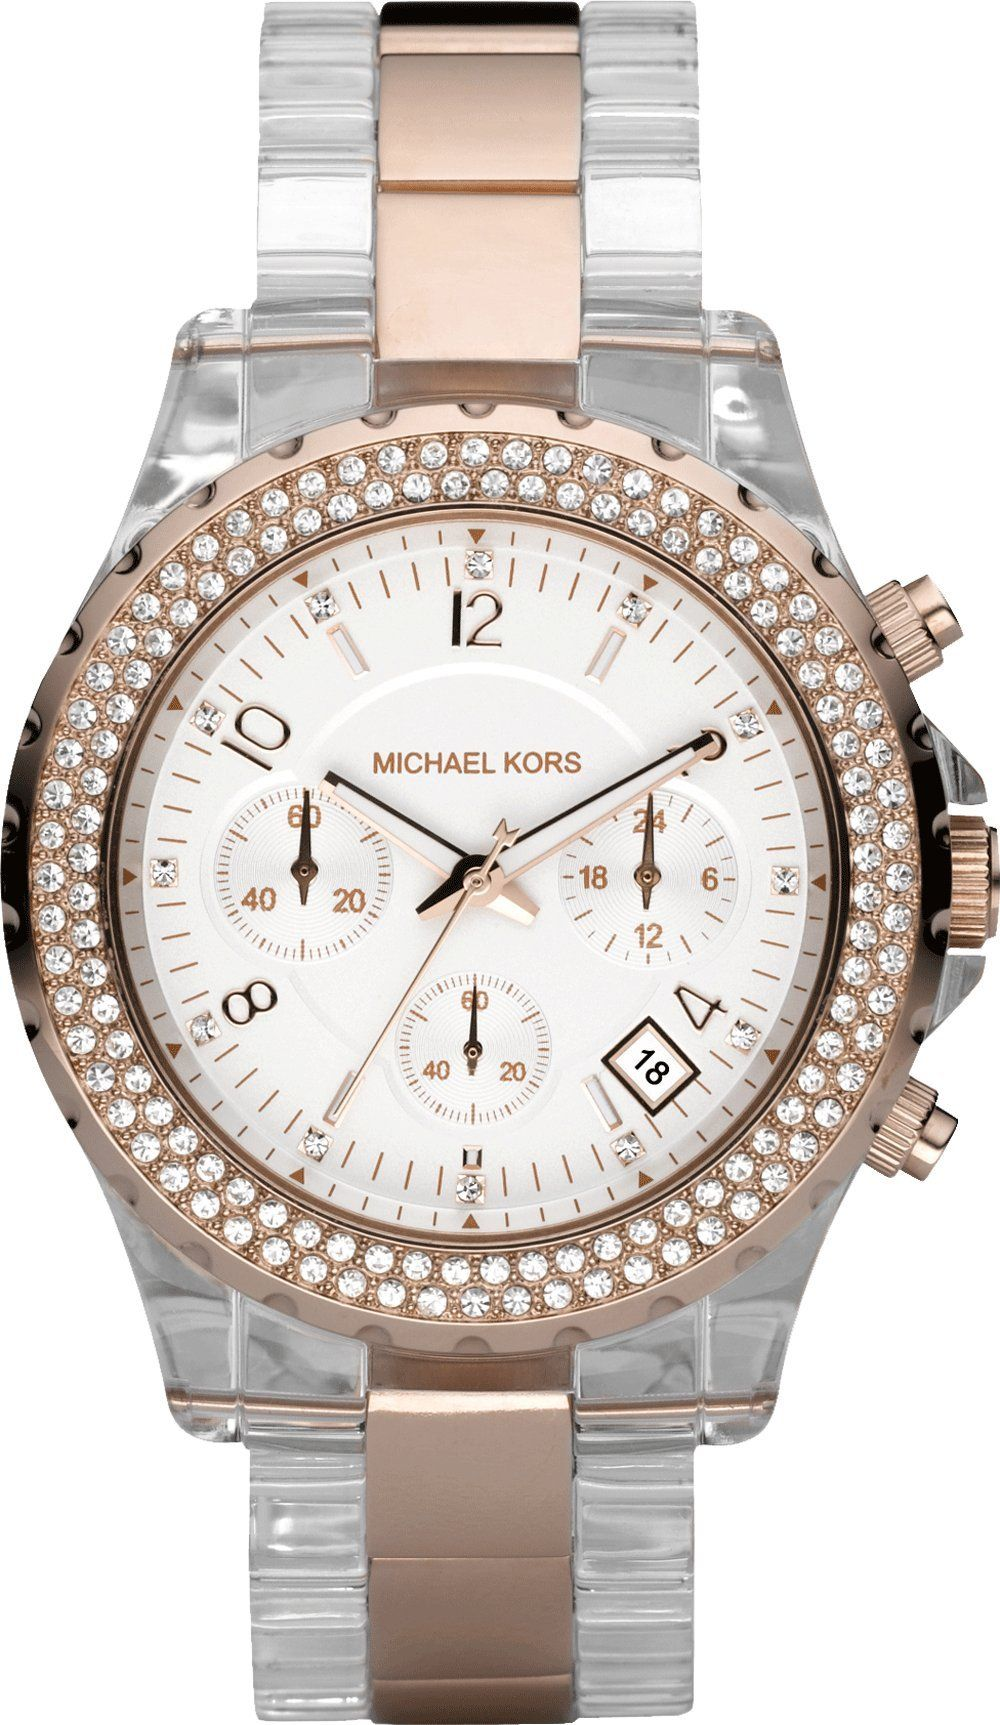 d9b581d1ff44 Michael Kors Michaël Kors - Reloj analógico de cuarzo para mujer con correa  de plástico